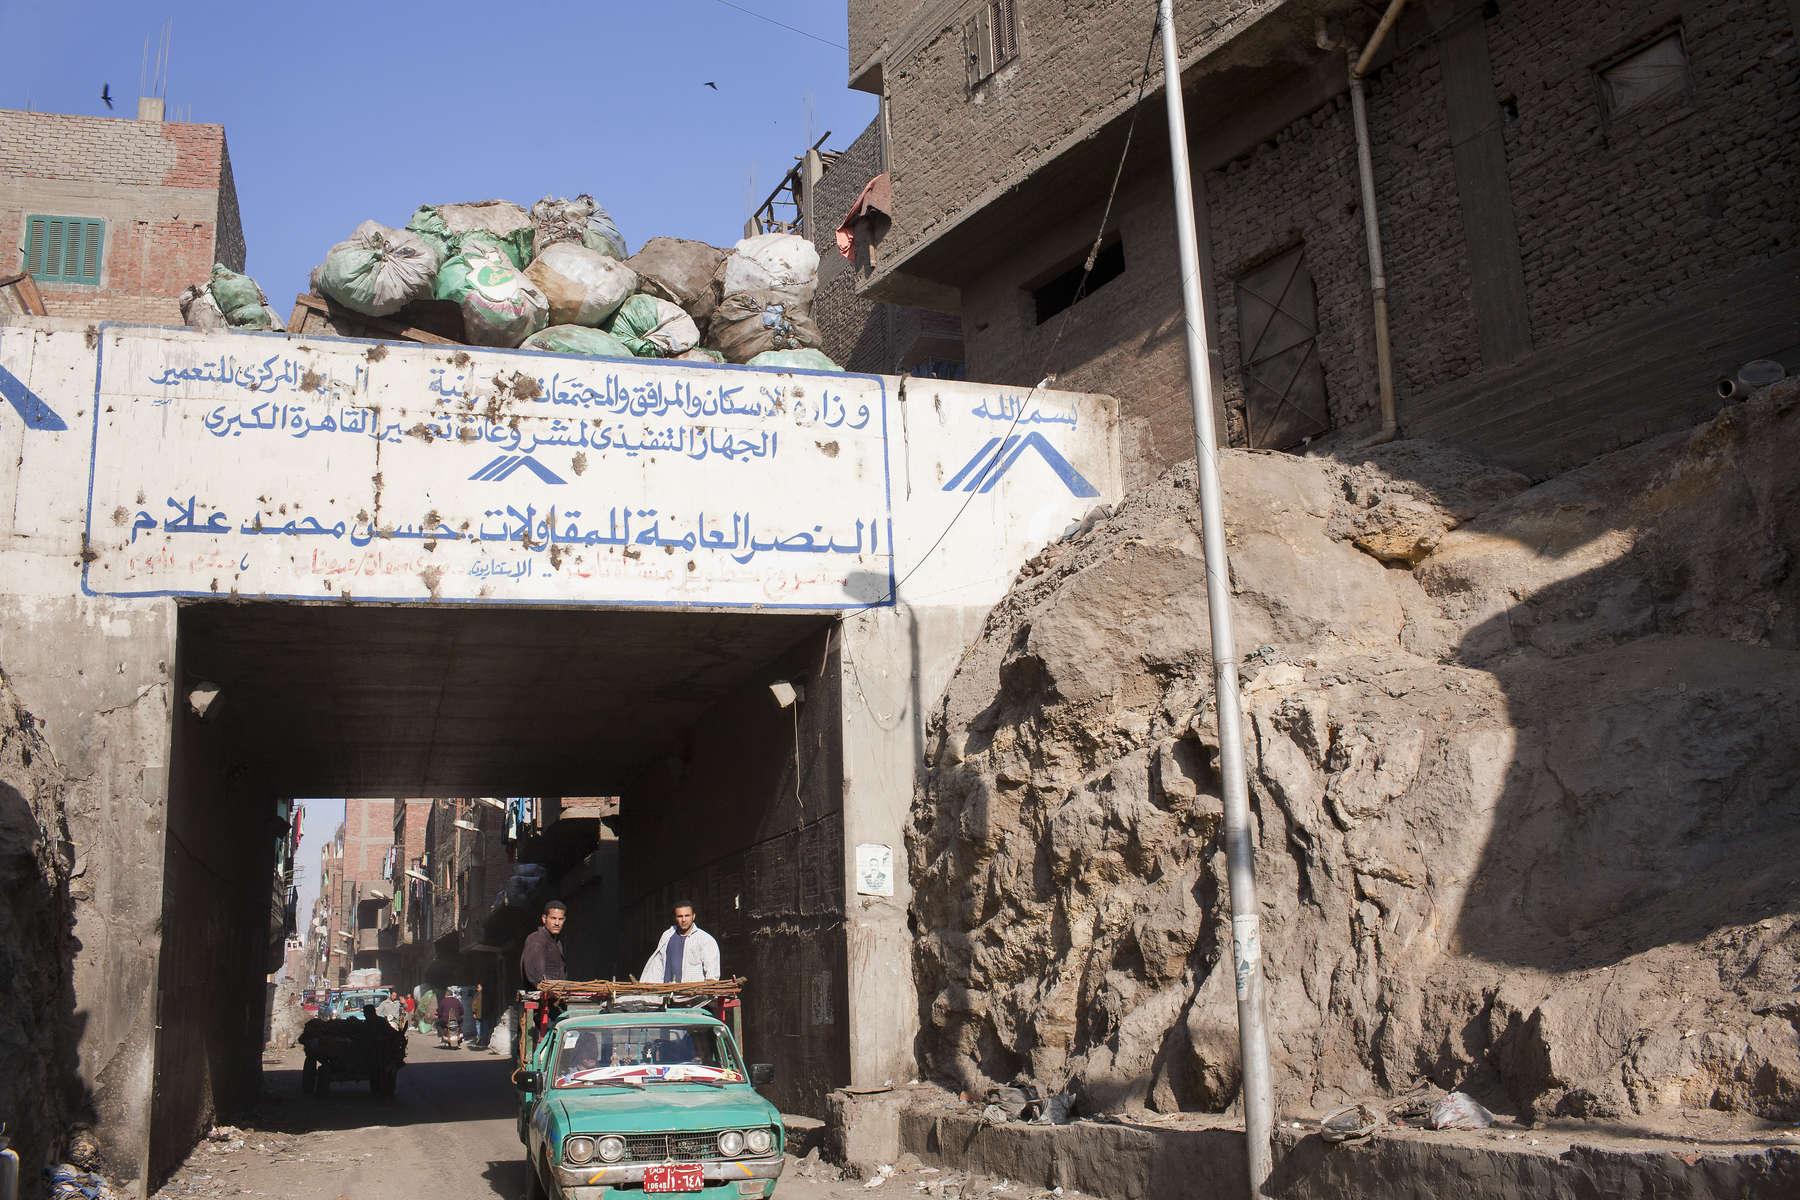 Zabaleen of Moqqatam - Crap Bridge